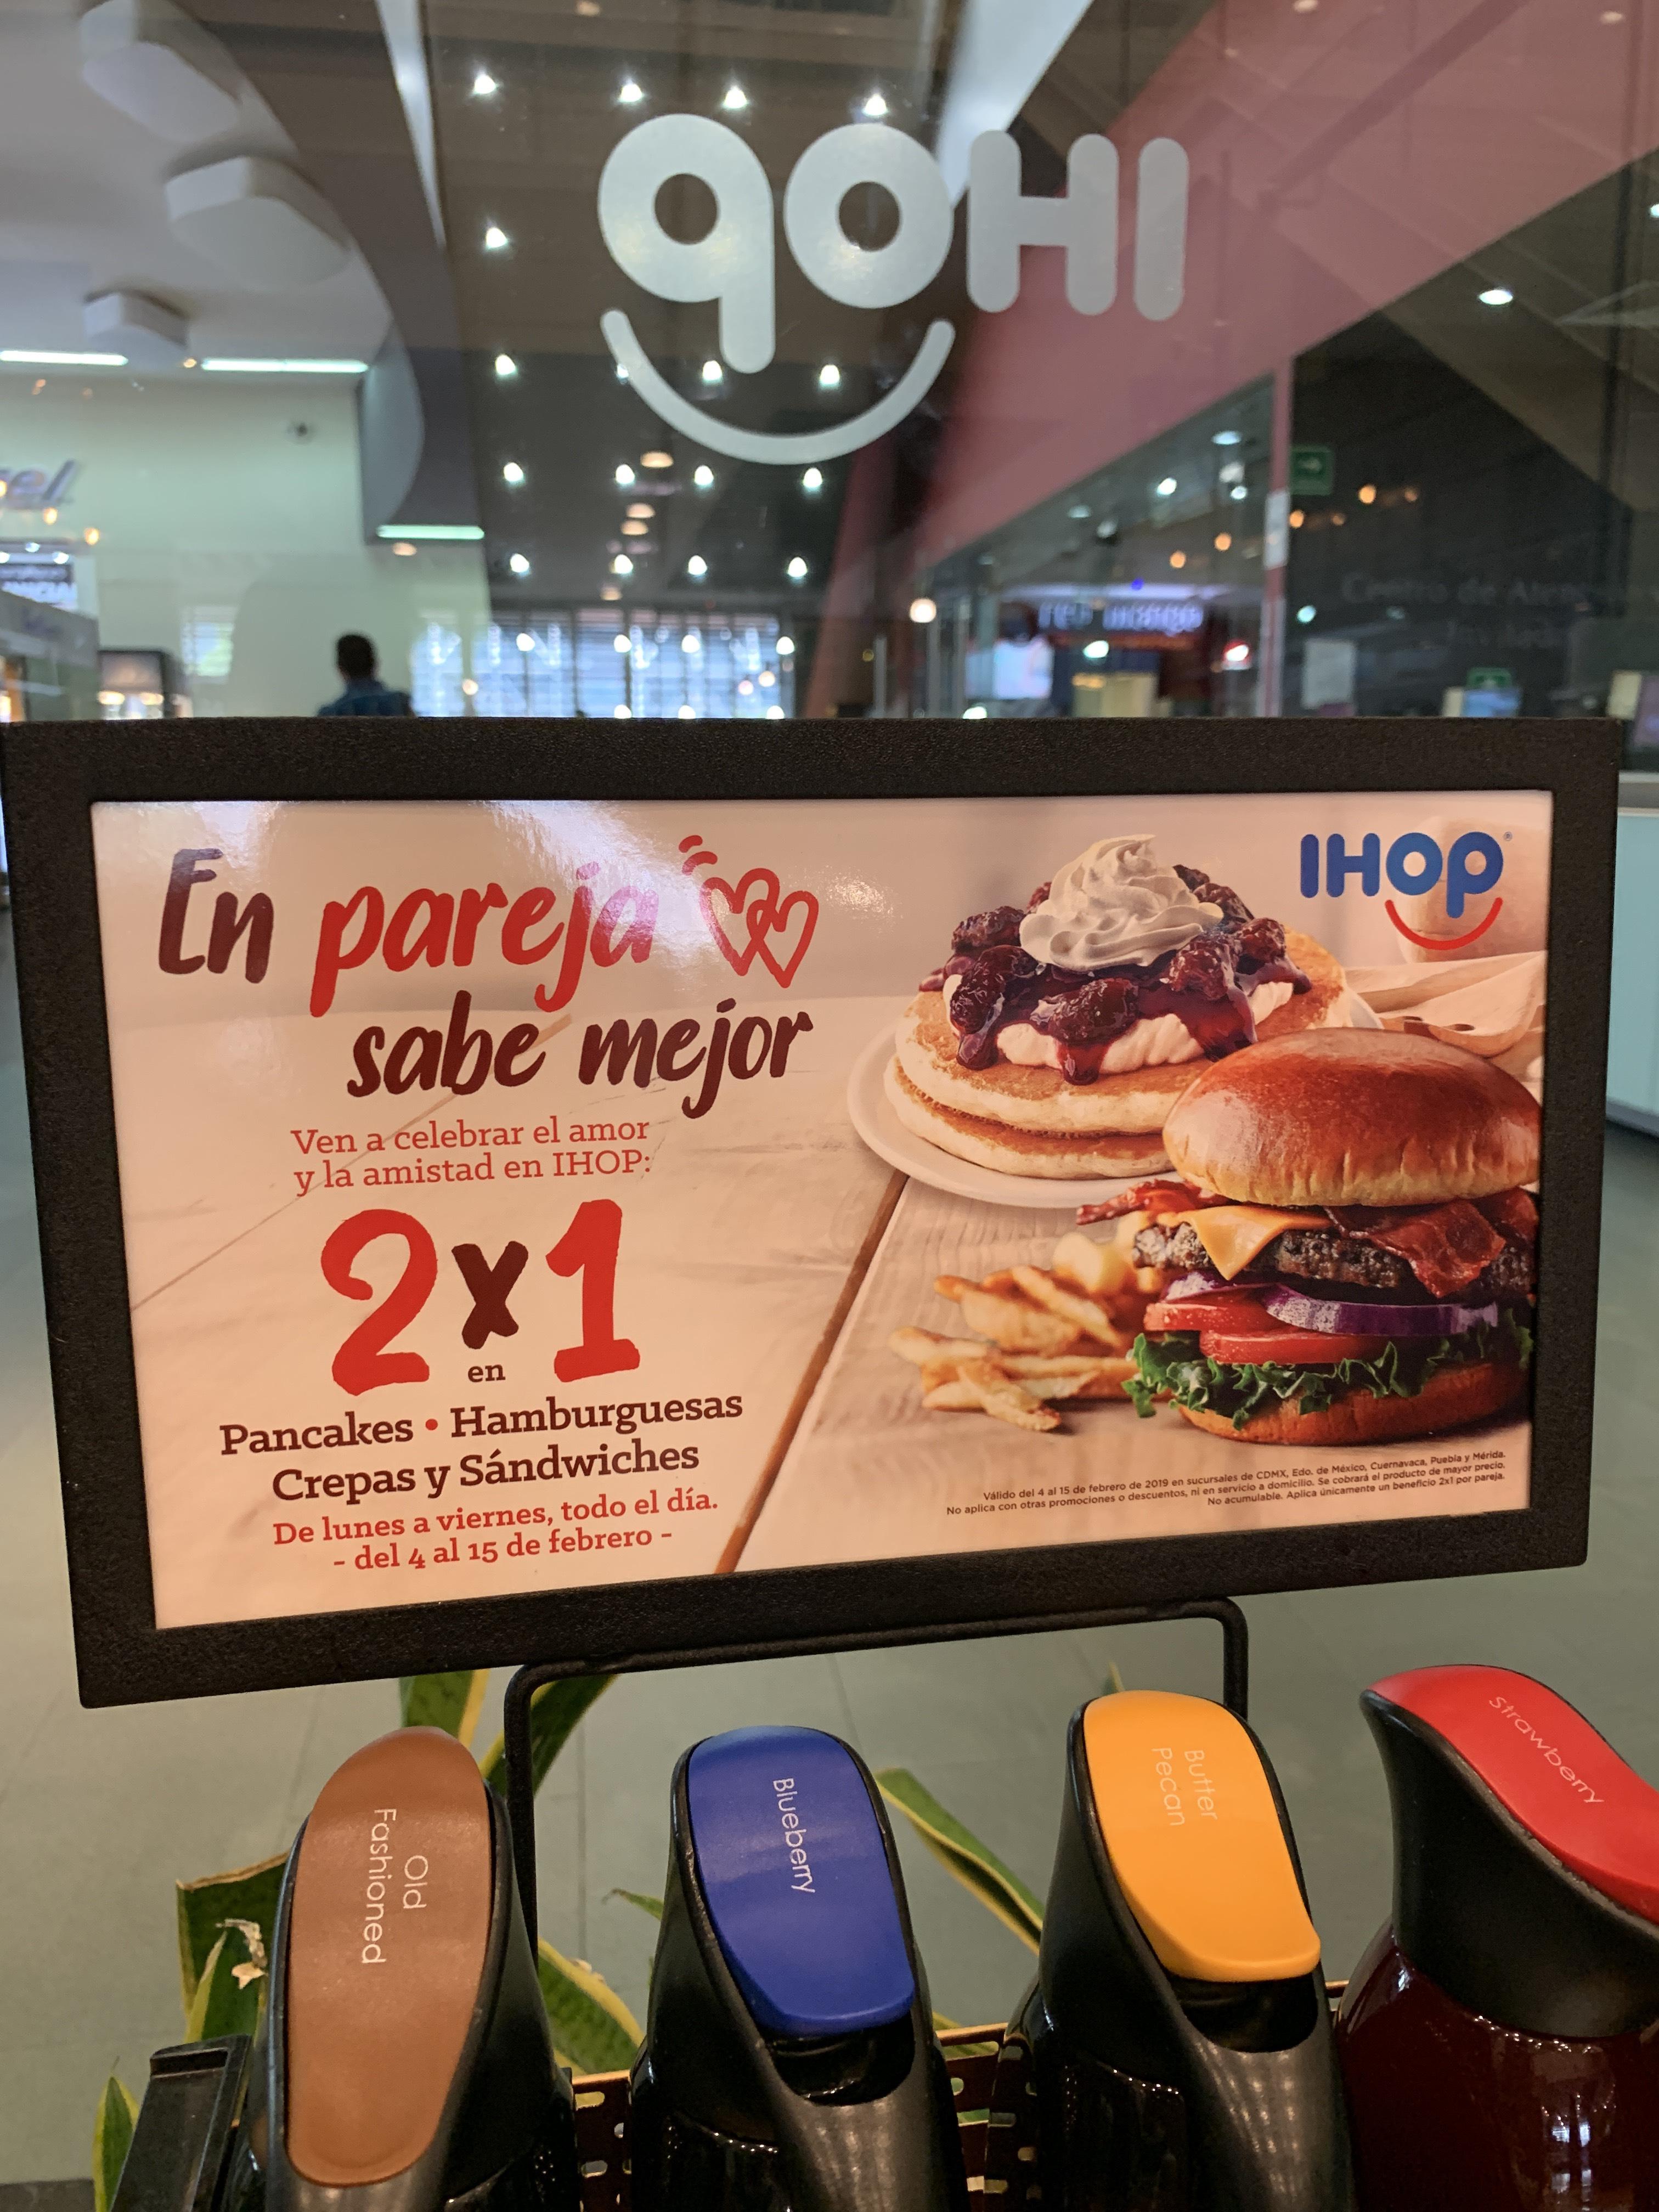 iHop: Hamburguesas, crepas y sándwiches 2x1